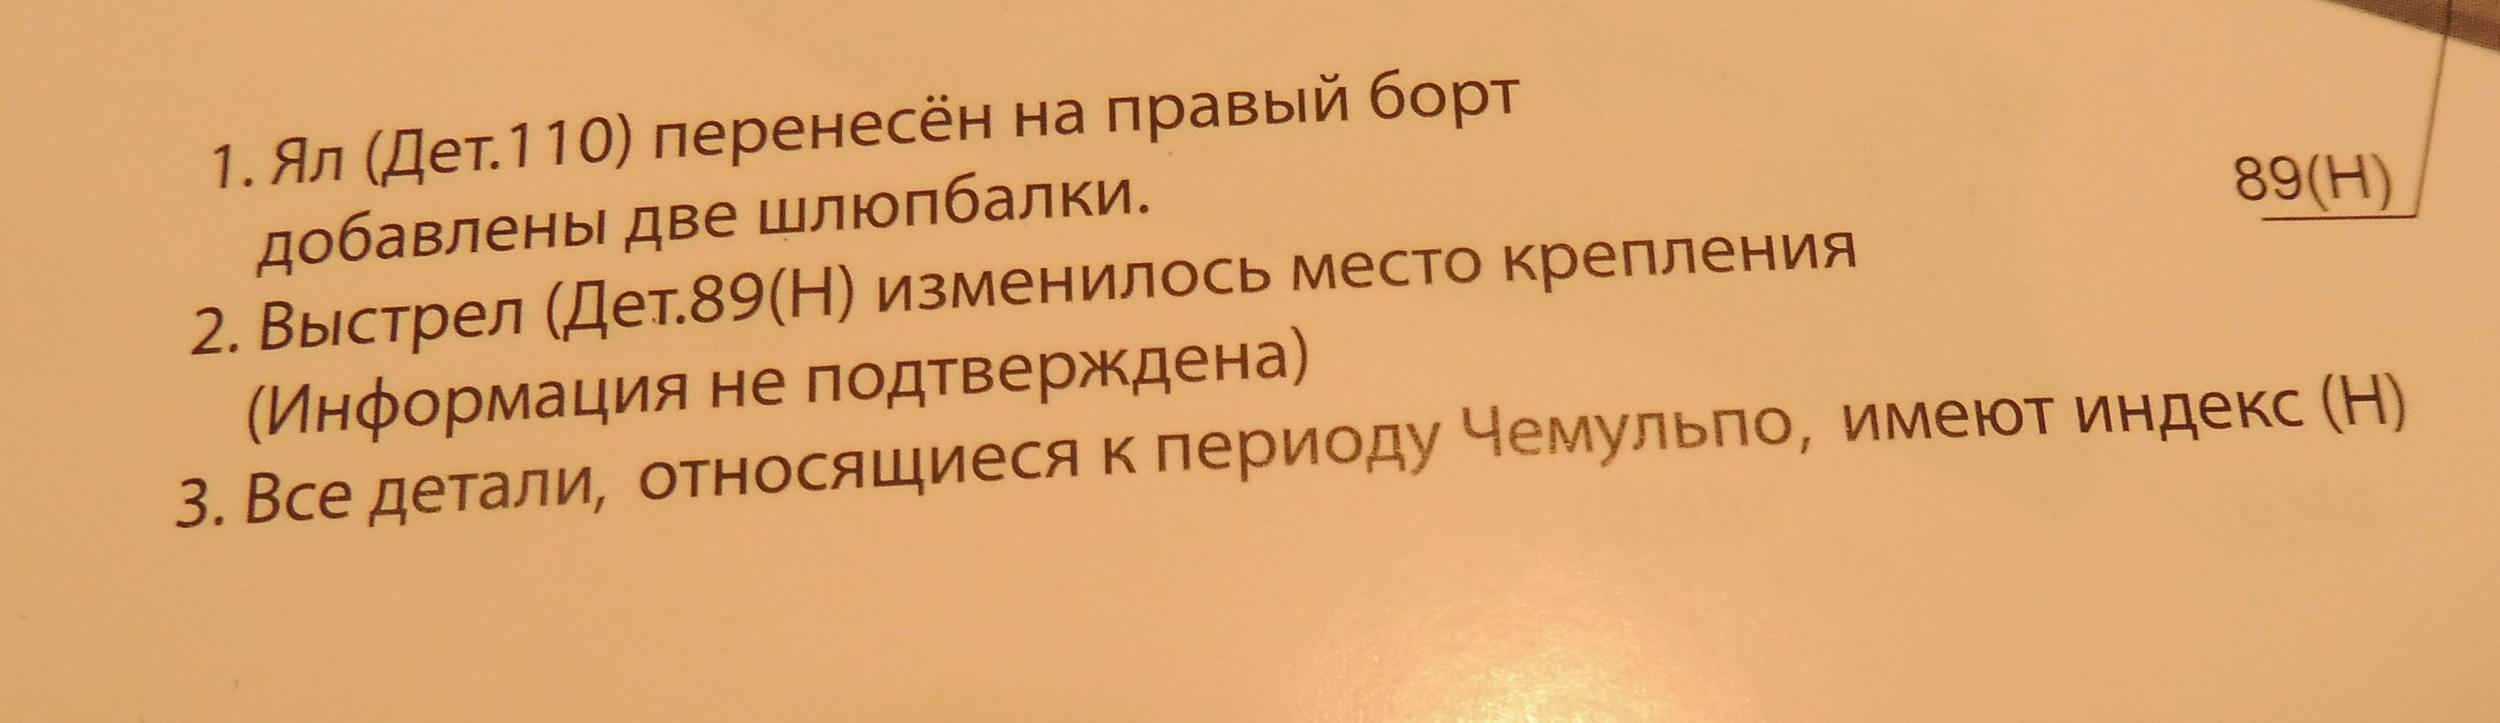 [Obrazek: 297_07_07_20_8_56_45_122701757.jpeg]